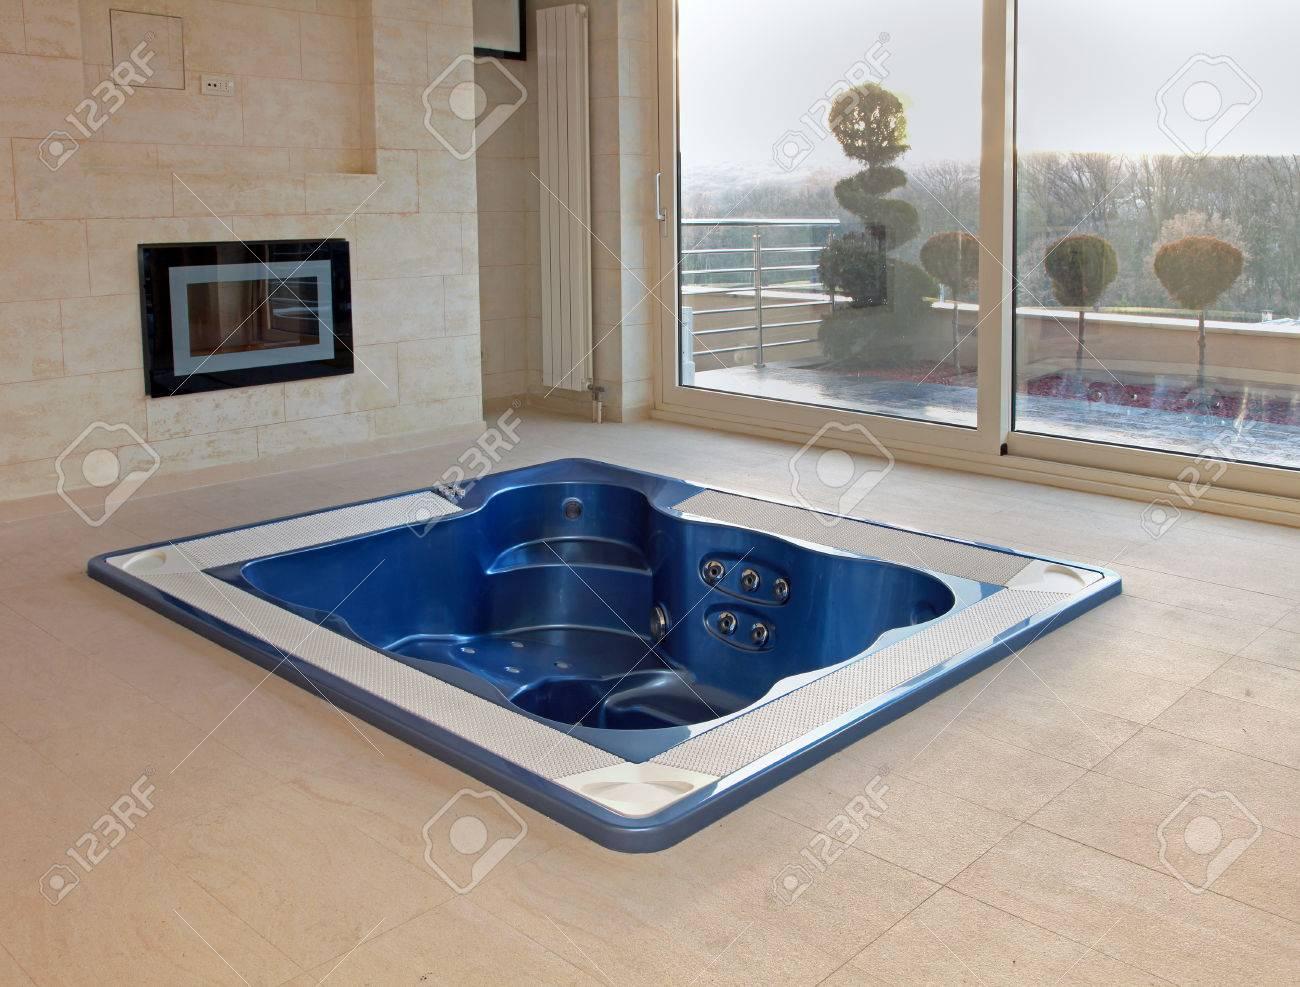 Attractive Oval Hot Tub Image - Bathtub Design Ideas - klotsnet.com